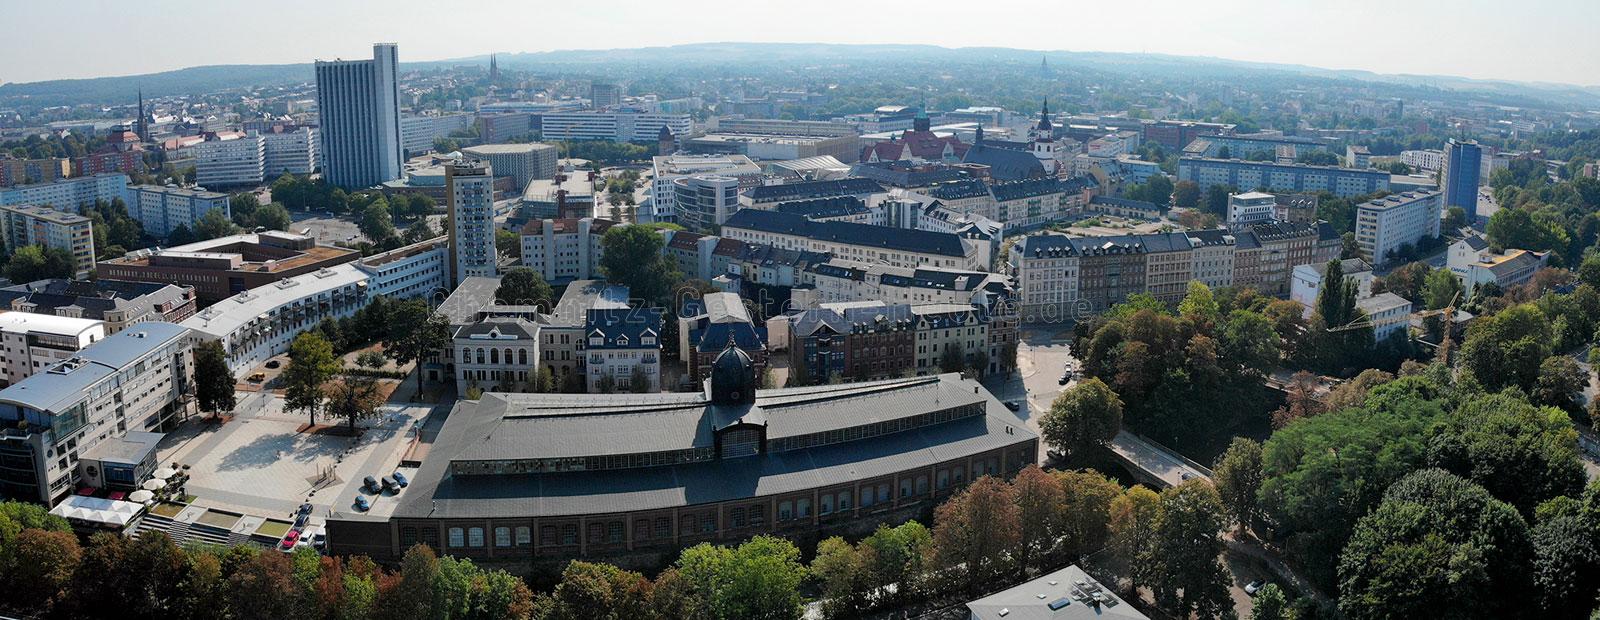 2018-08-19-Kassberg4-1600-620